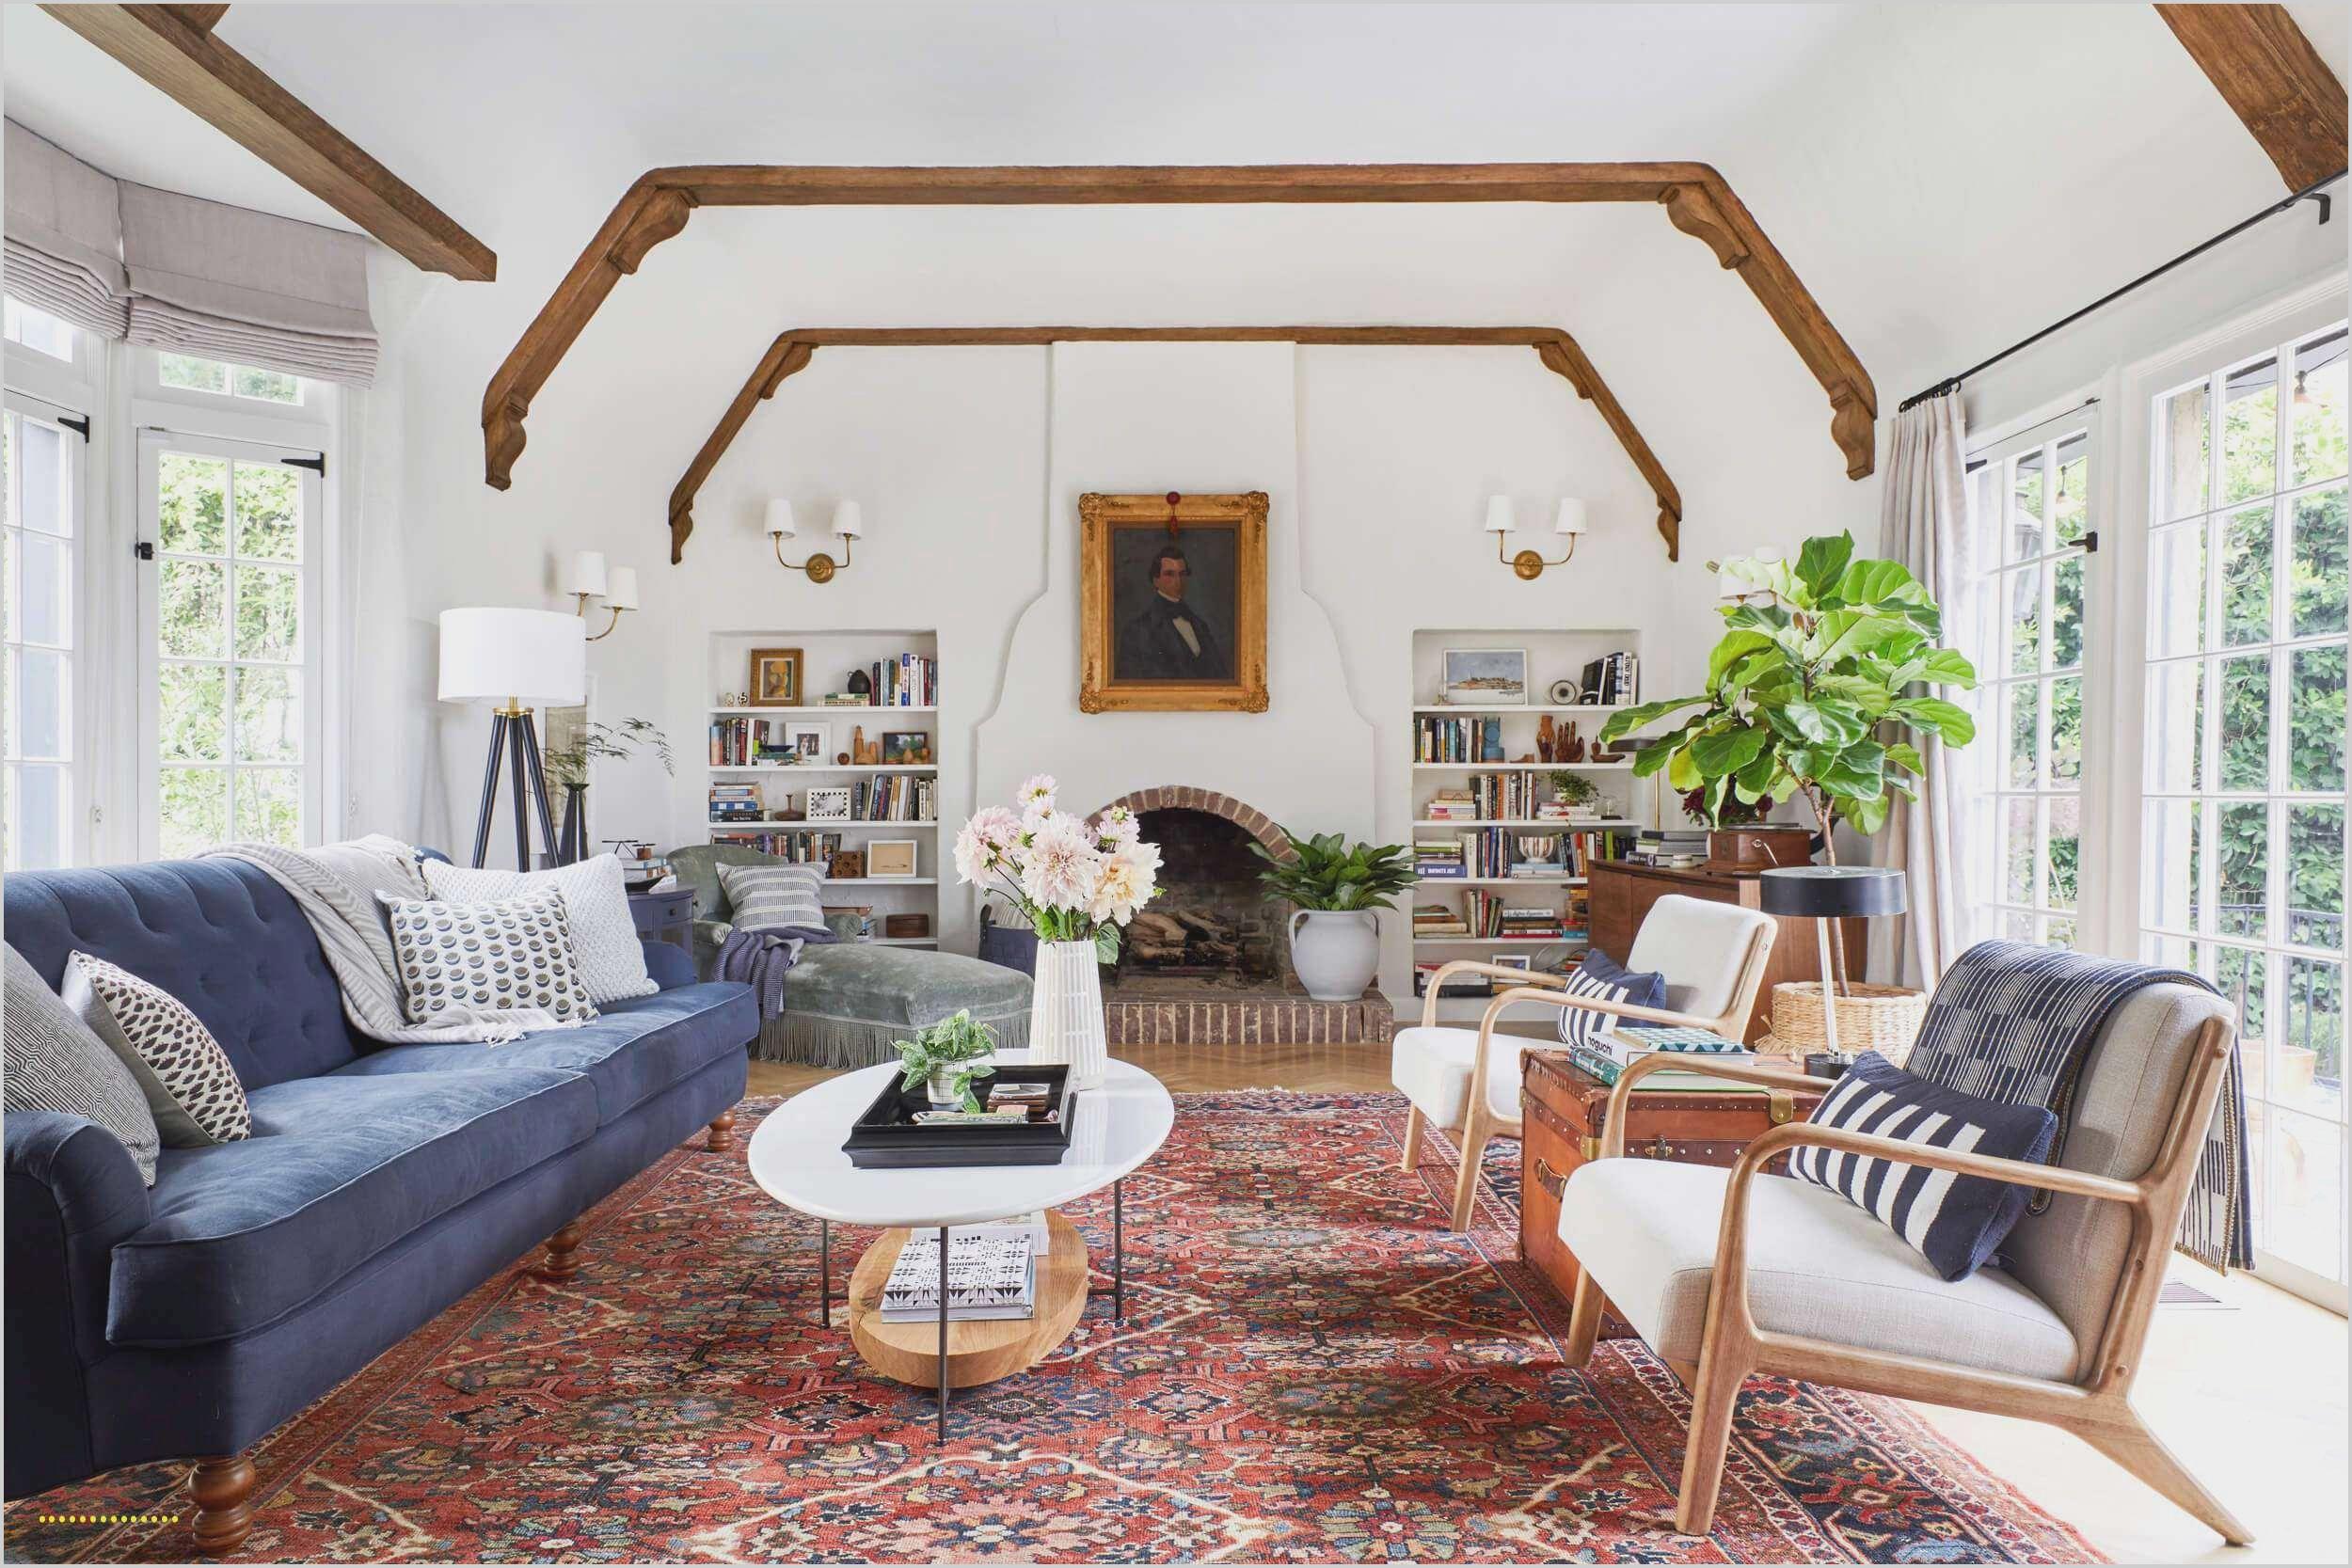 Living Room Decor Ideas For Single In 2020 Furniture Design